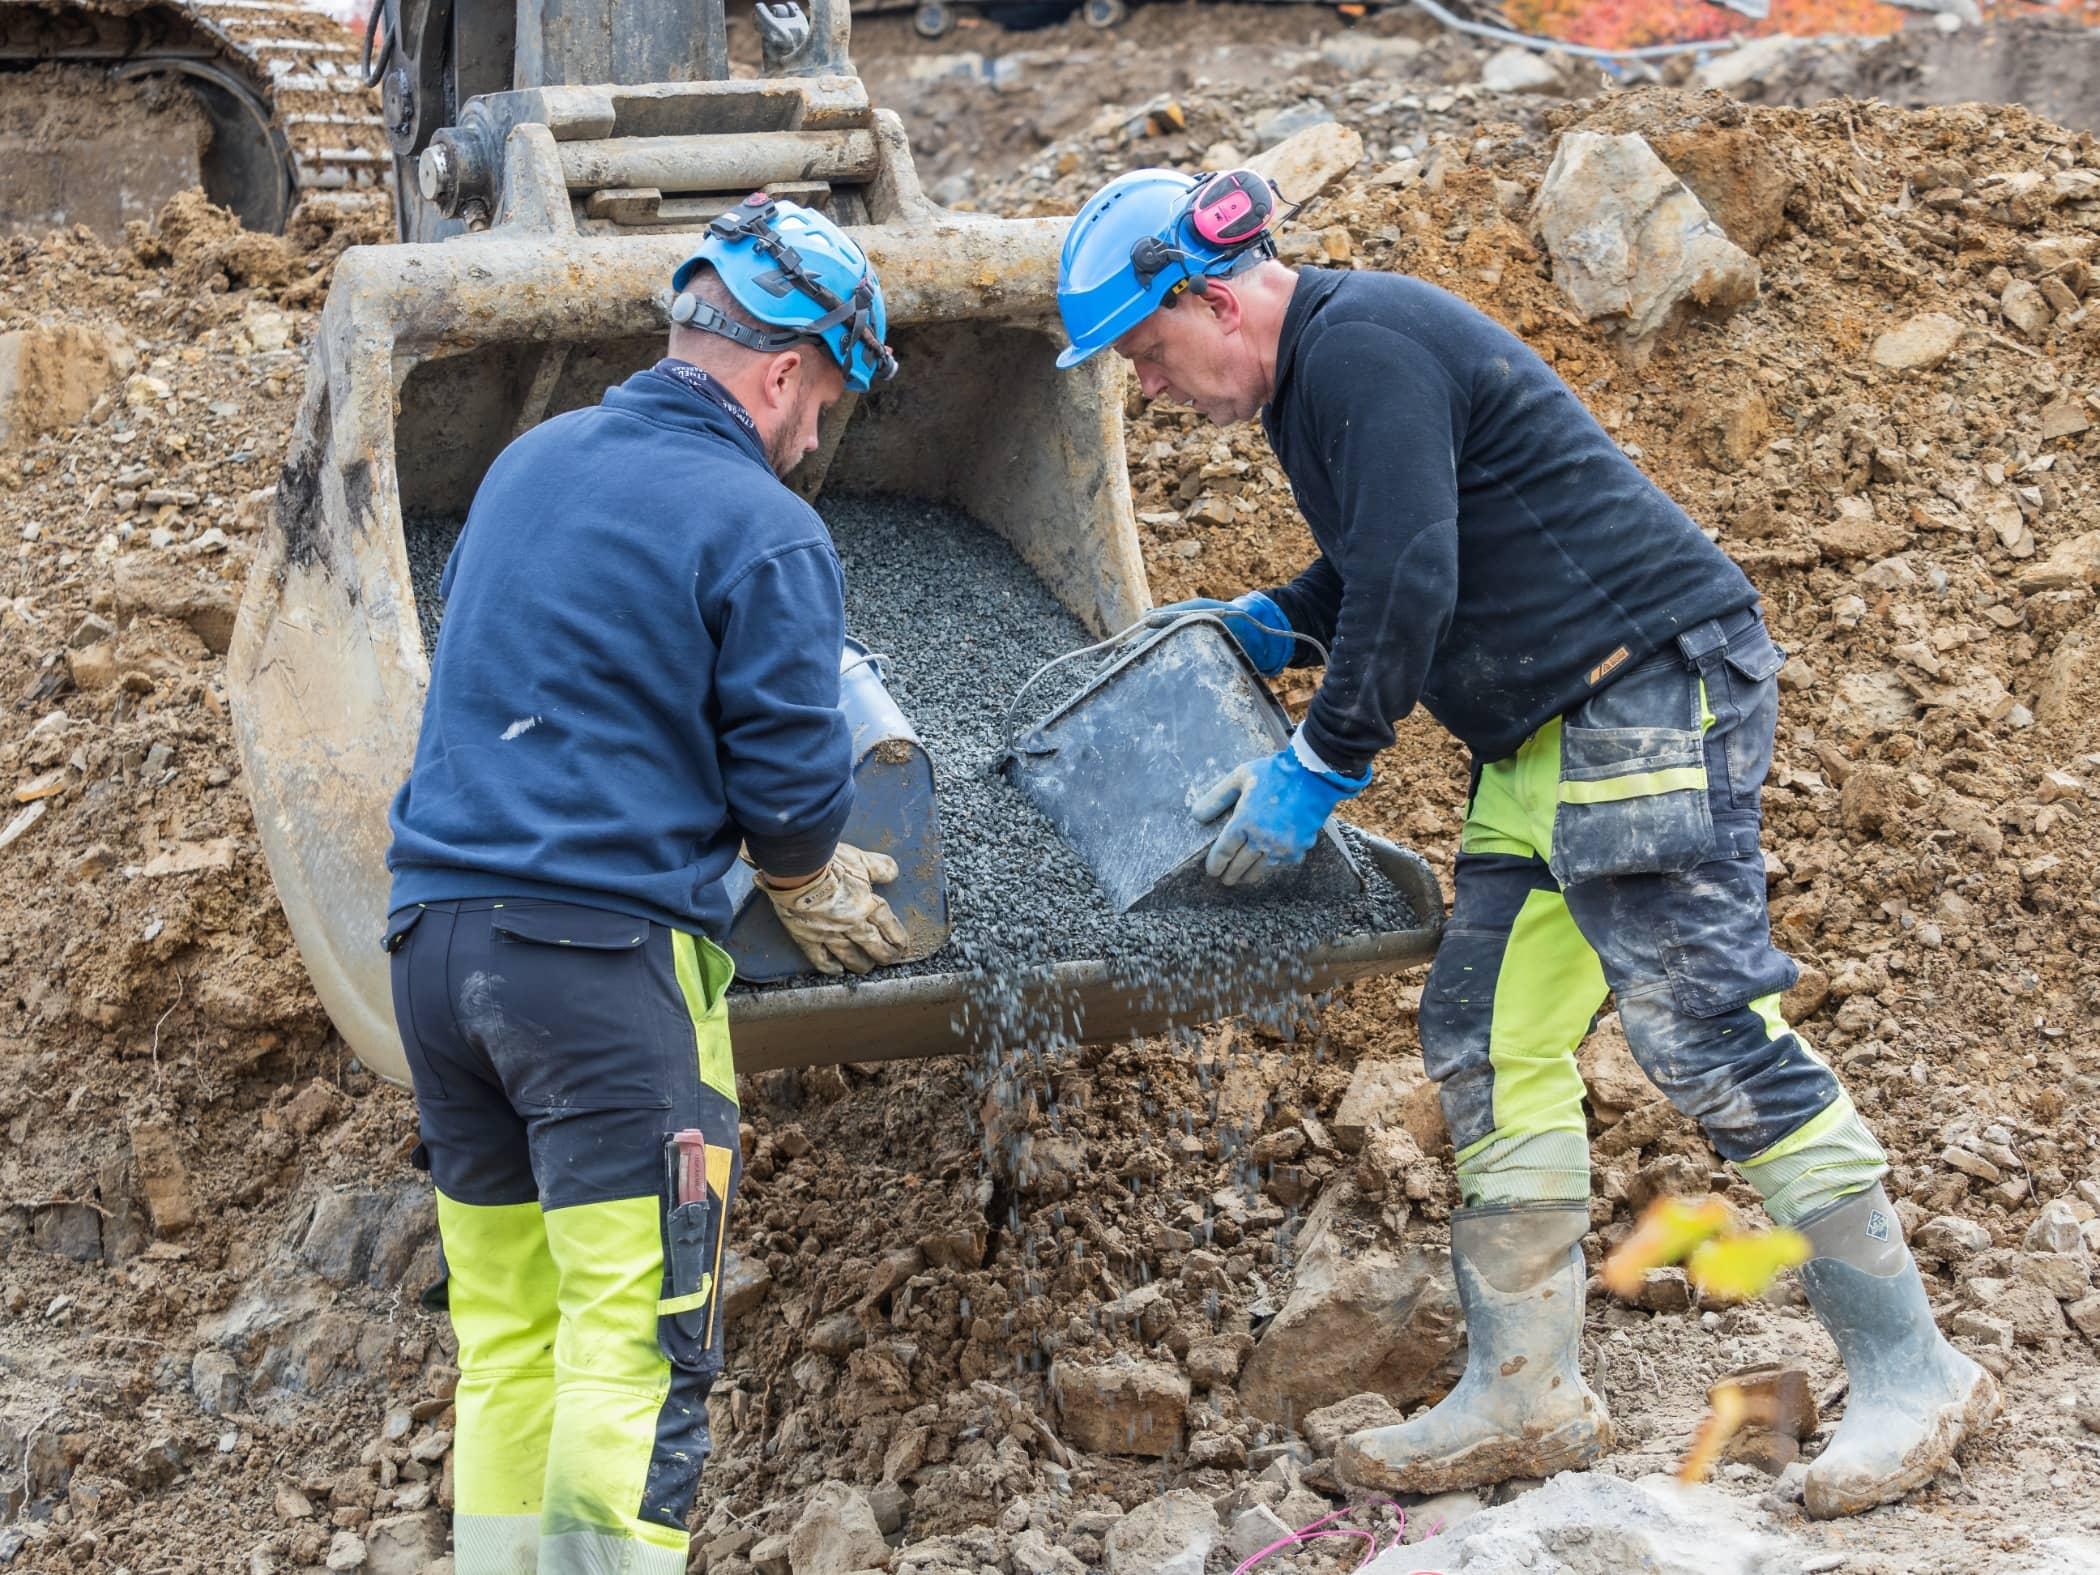 Construction worker, Soil